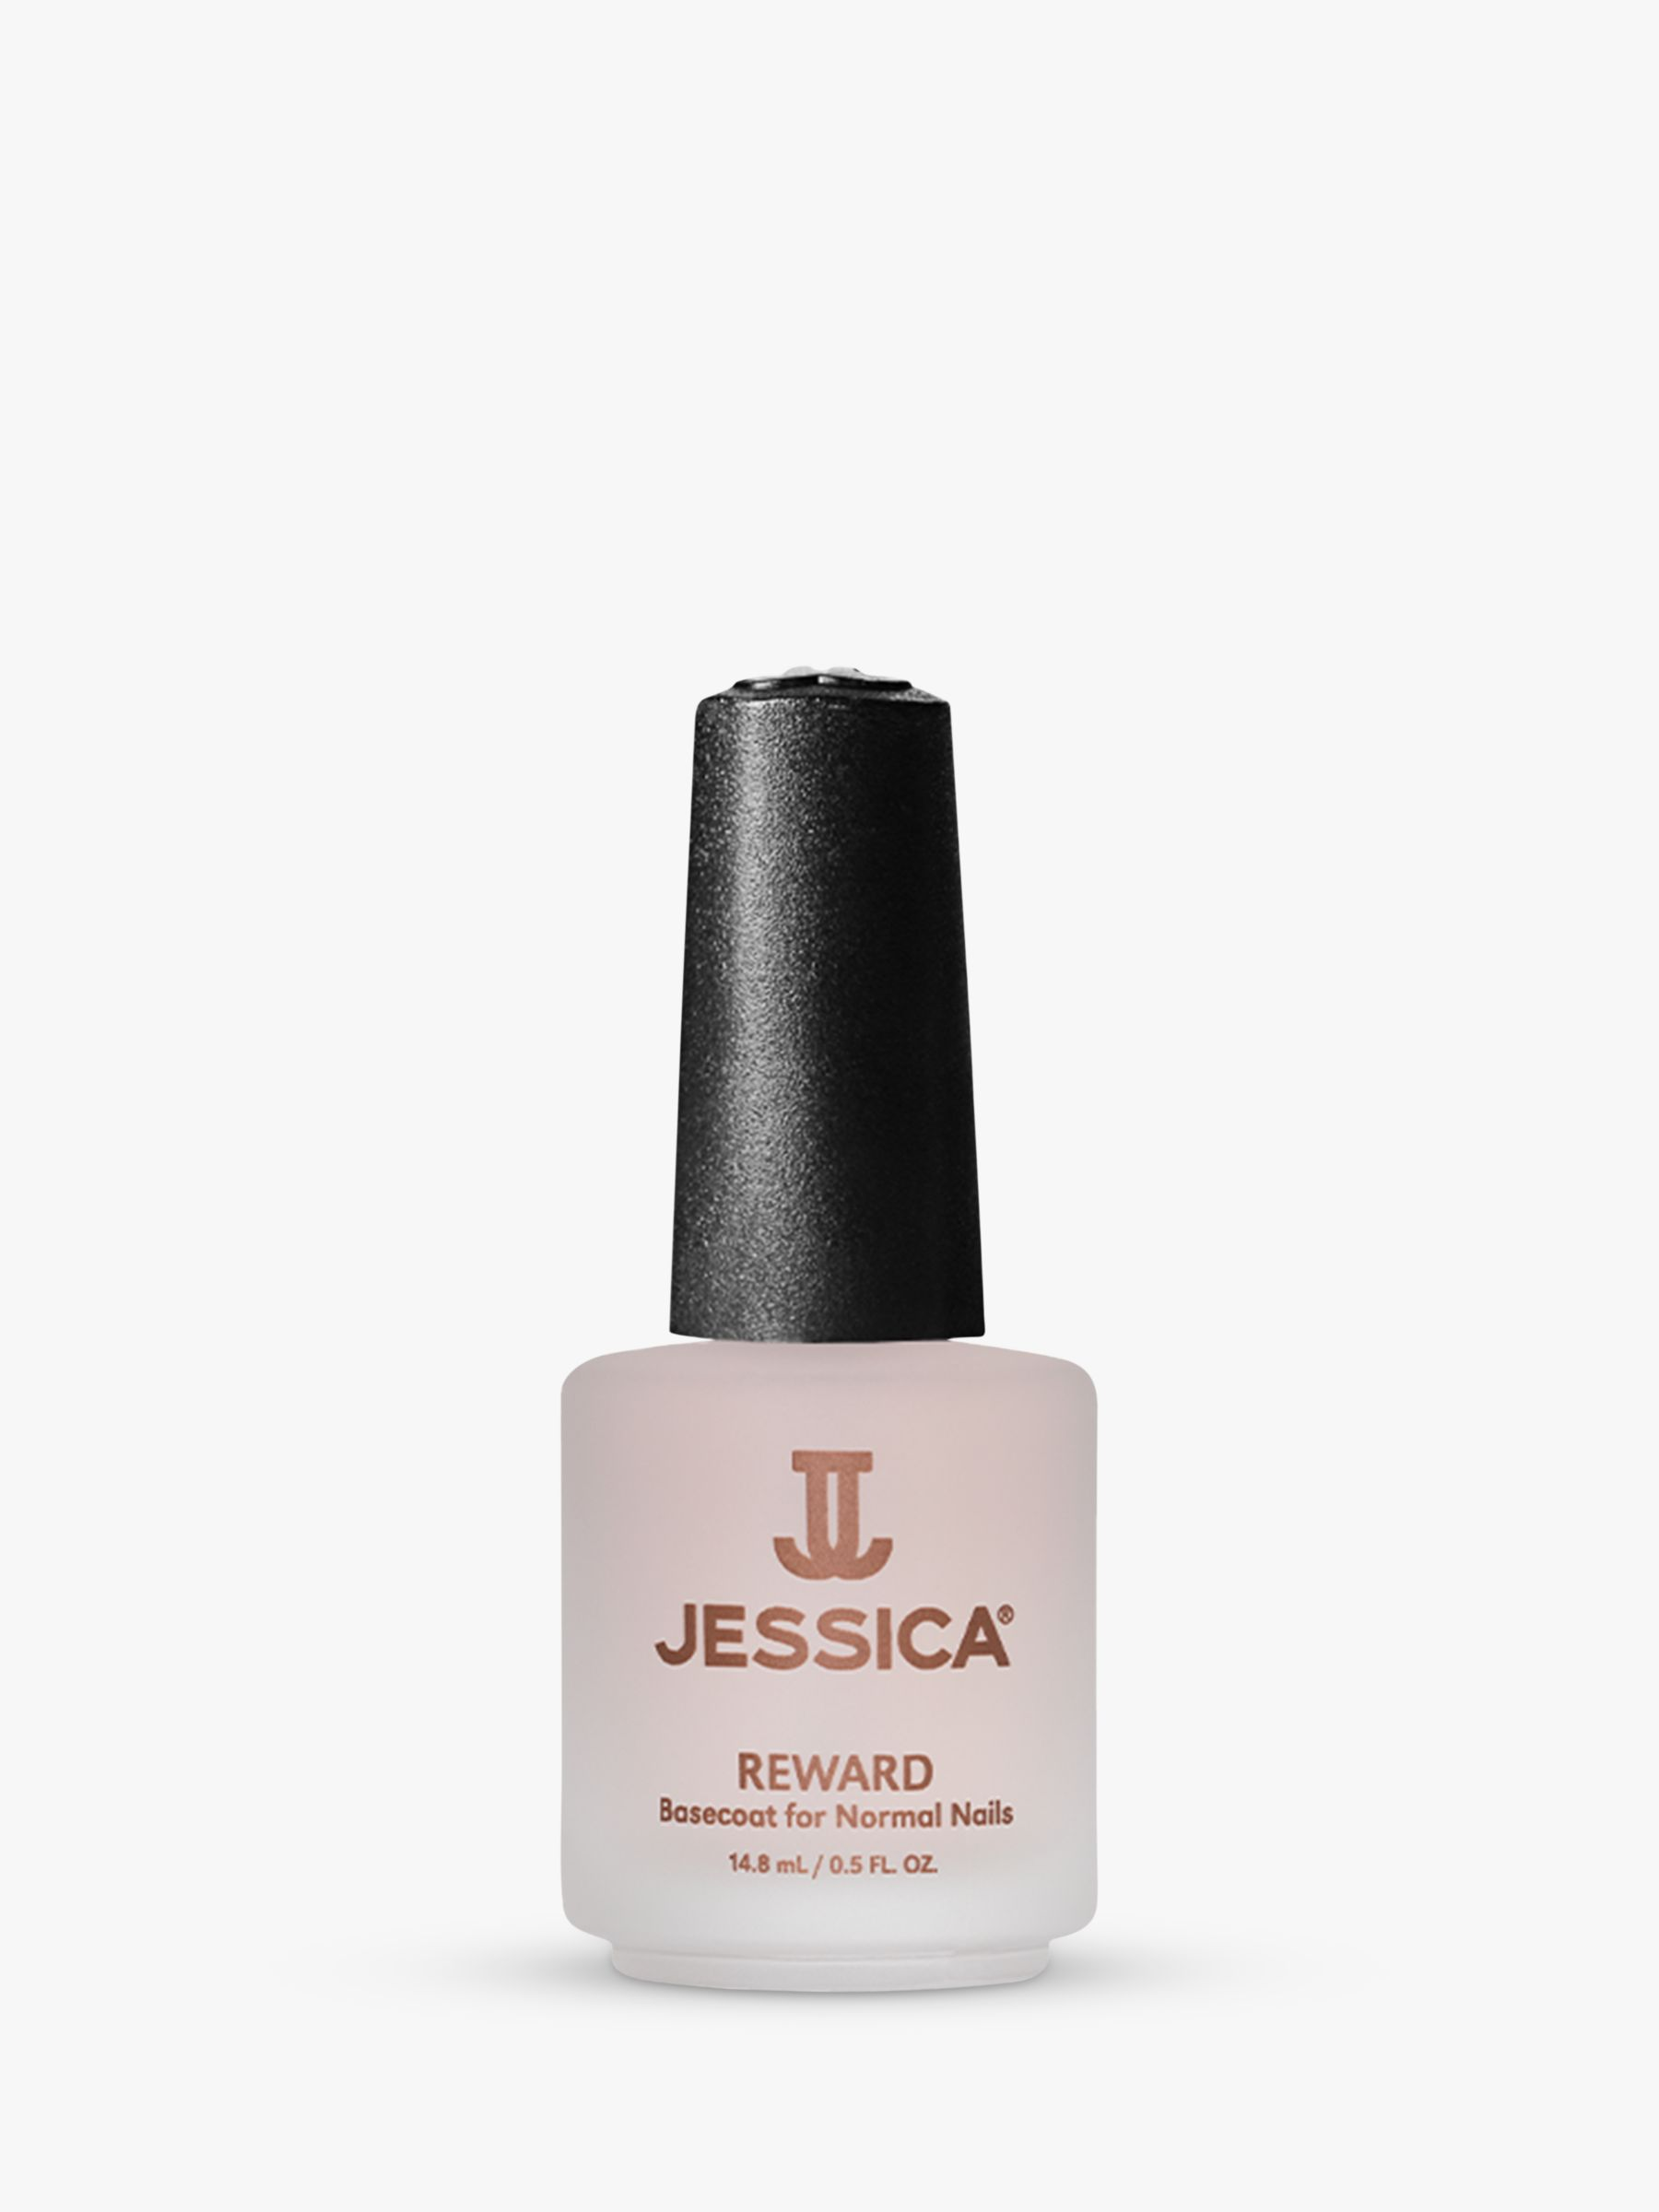 Jessica Jessica Reward Base Coat, 14.8ml